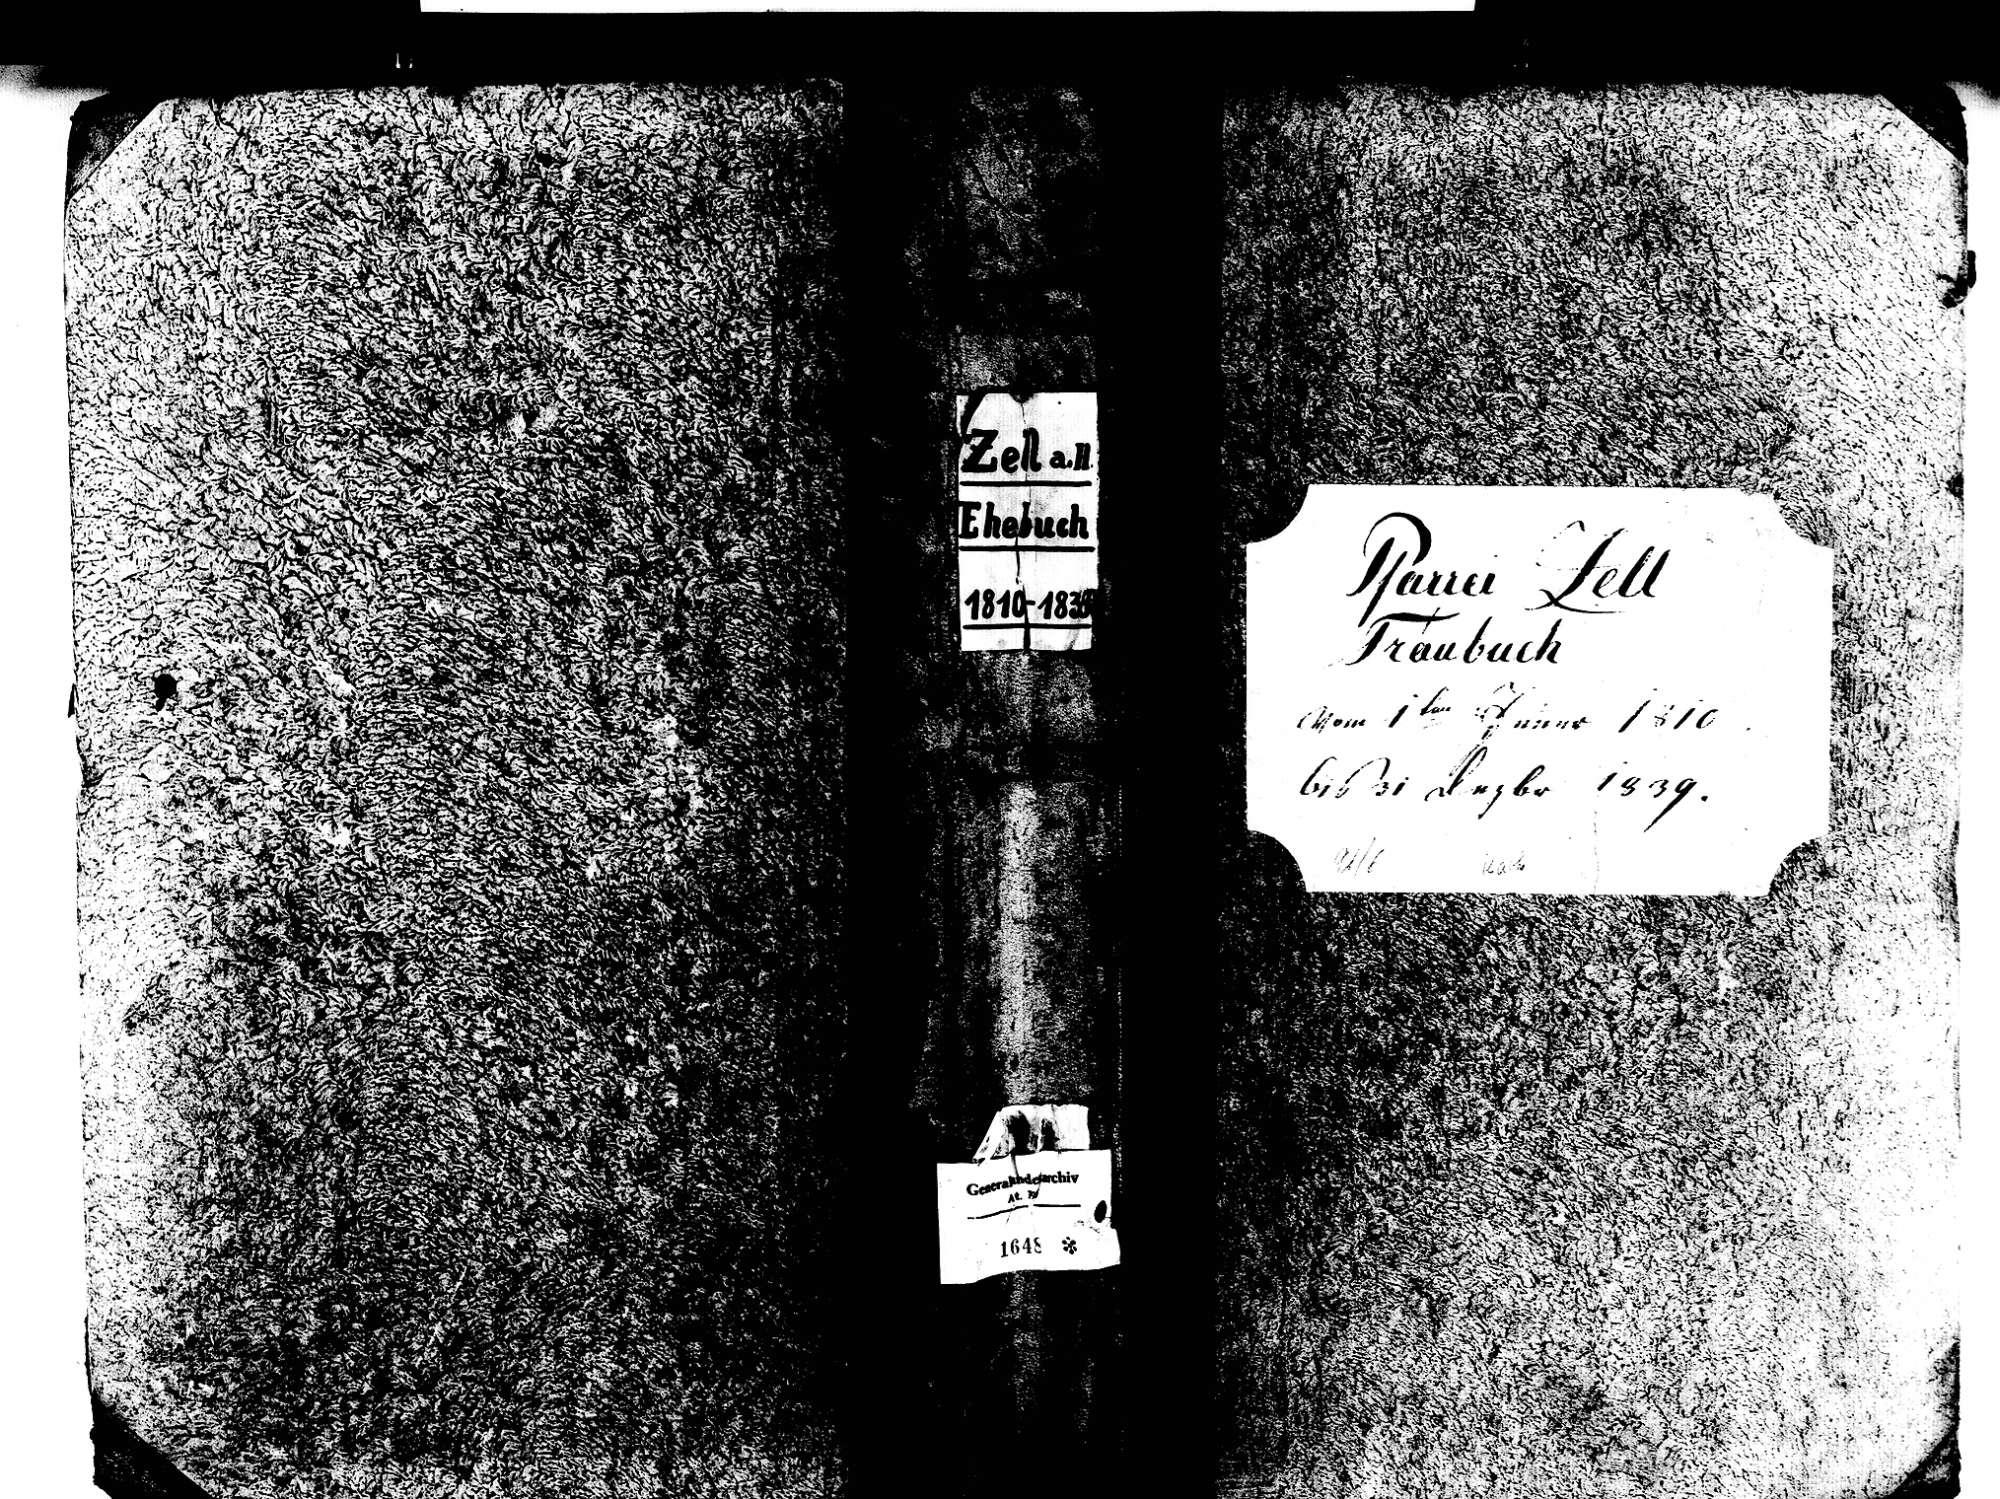 Zell am Harmersbach OG; Katholische Gemeinde: Heiratsbuch 1810-1839 Zell am Harmersbach OG; Katholische Gemeinde: Sterbebuch 1813, 1829, Bild 1